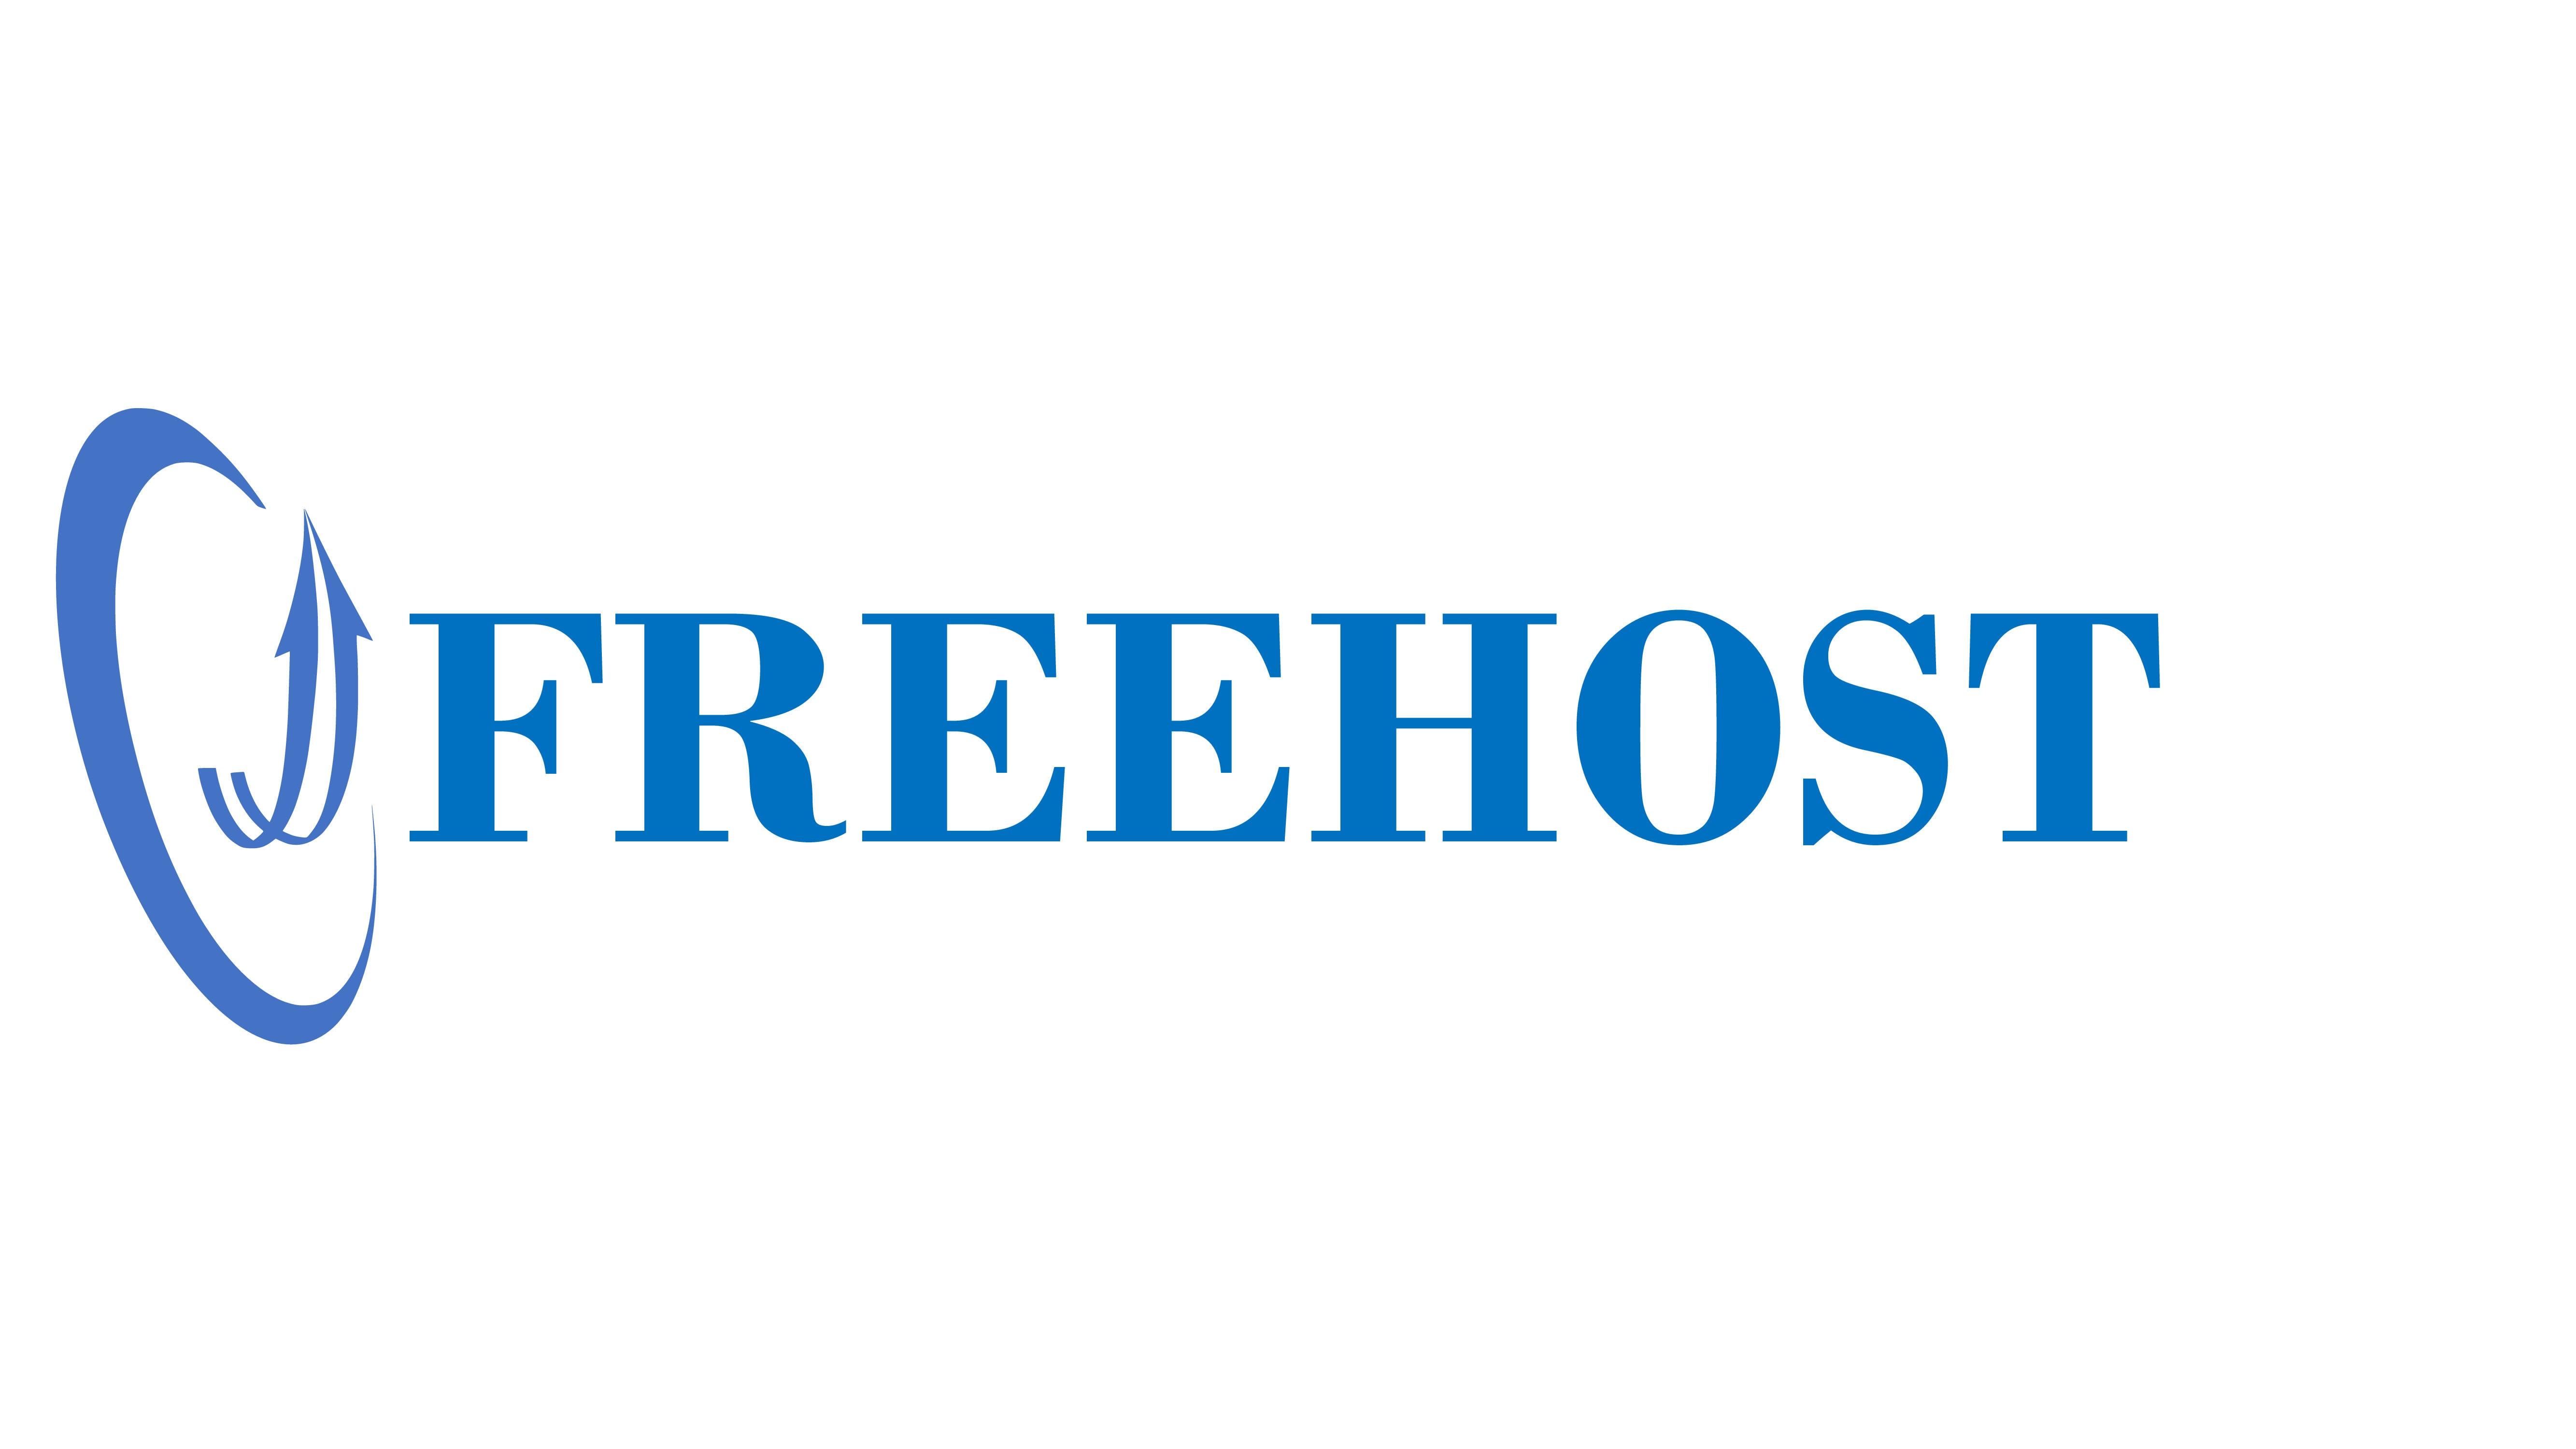 Free.Host